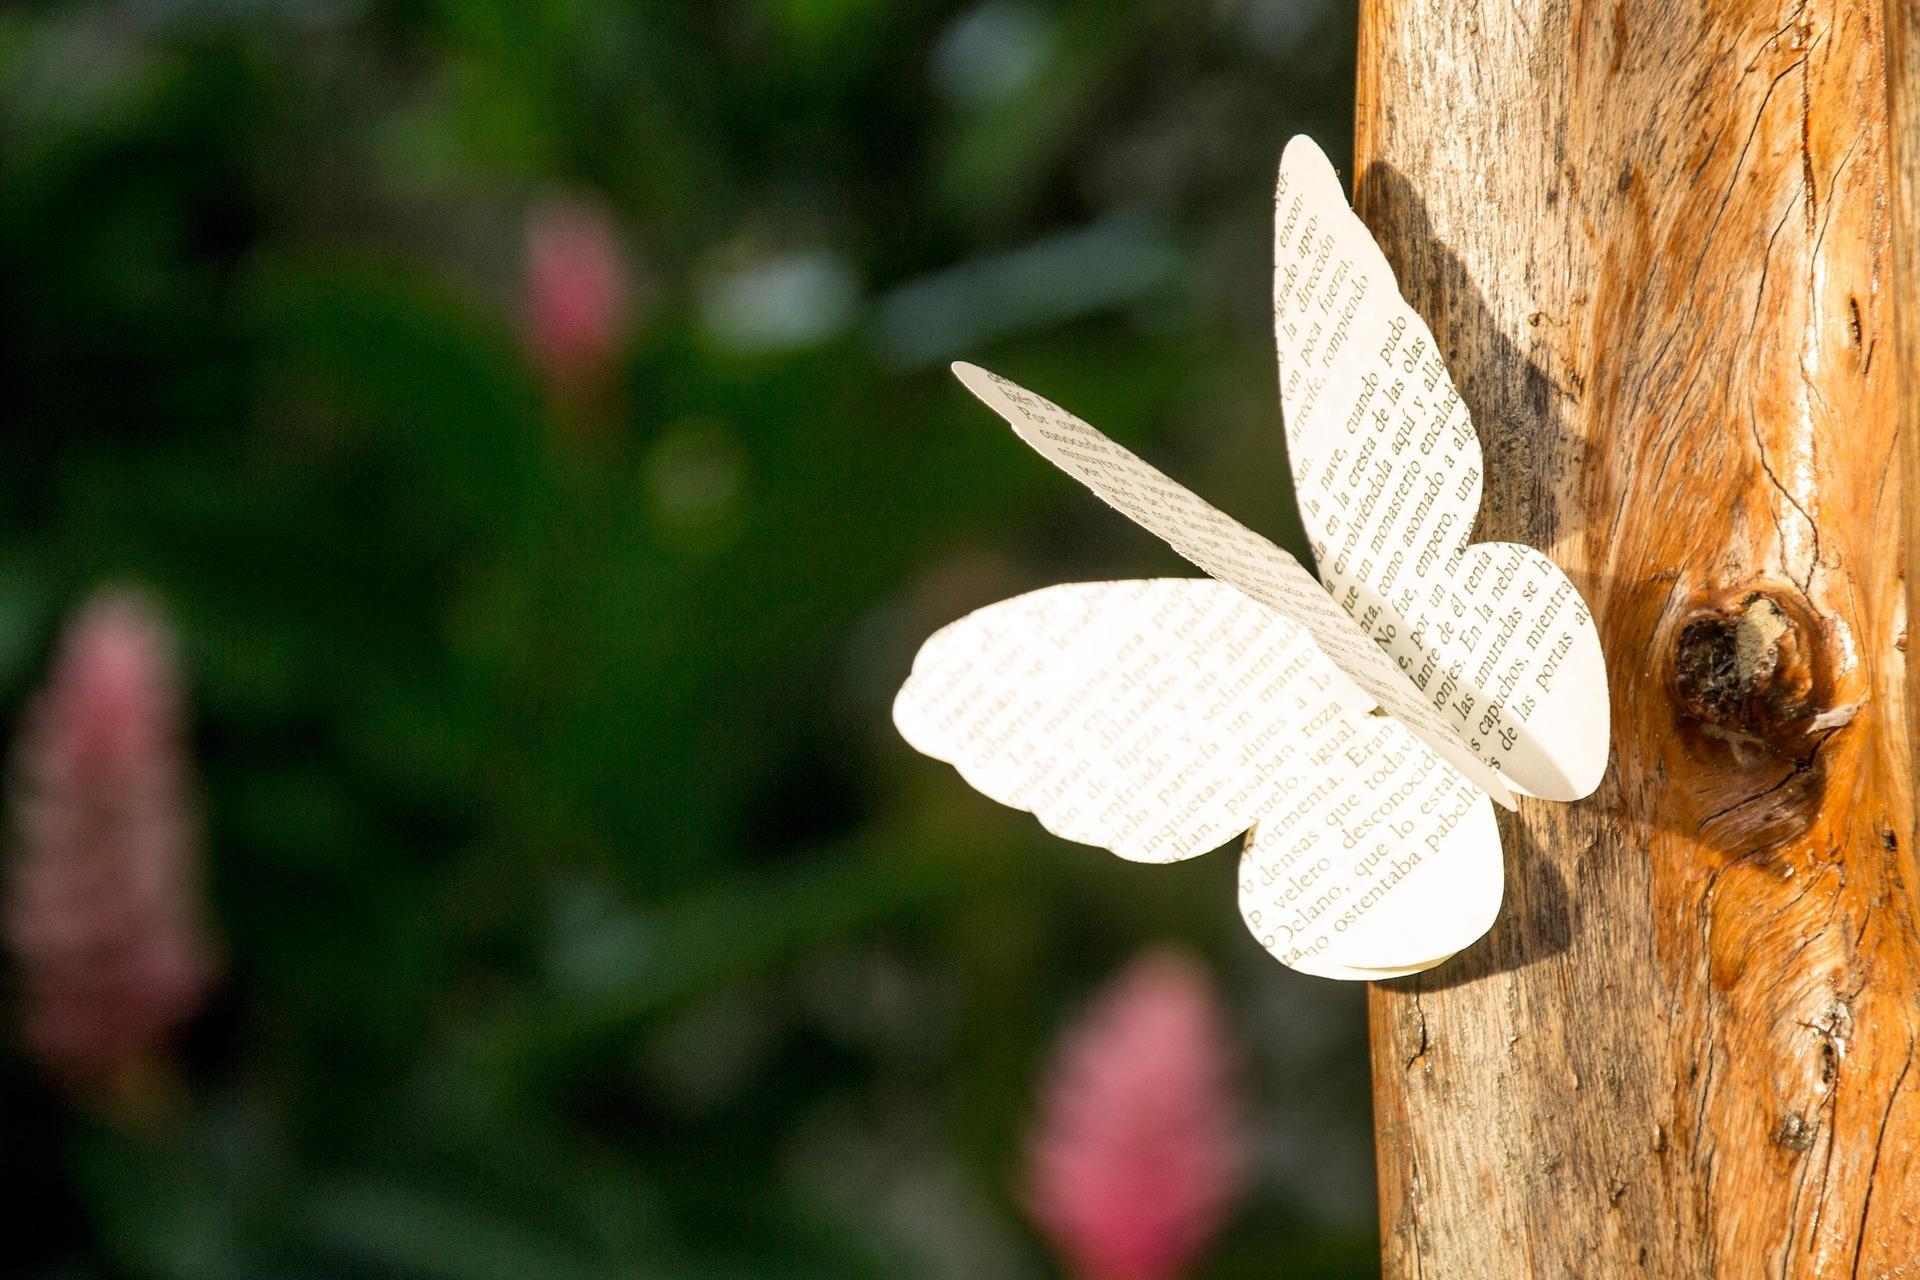 Sommerfugl lagd i papir, foto Idearriba fra Pixabay